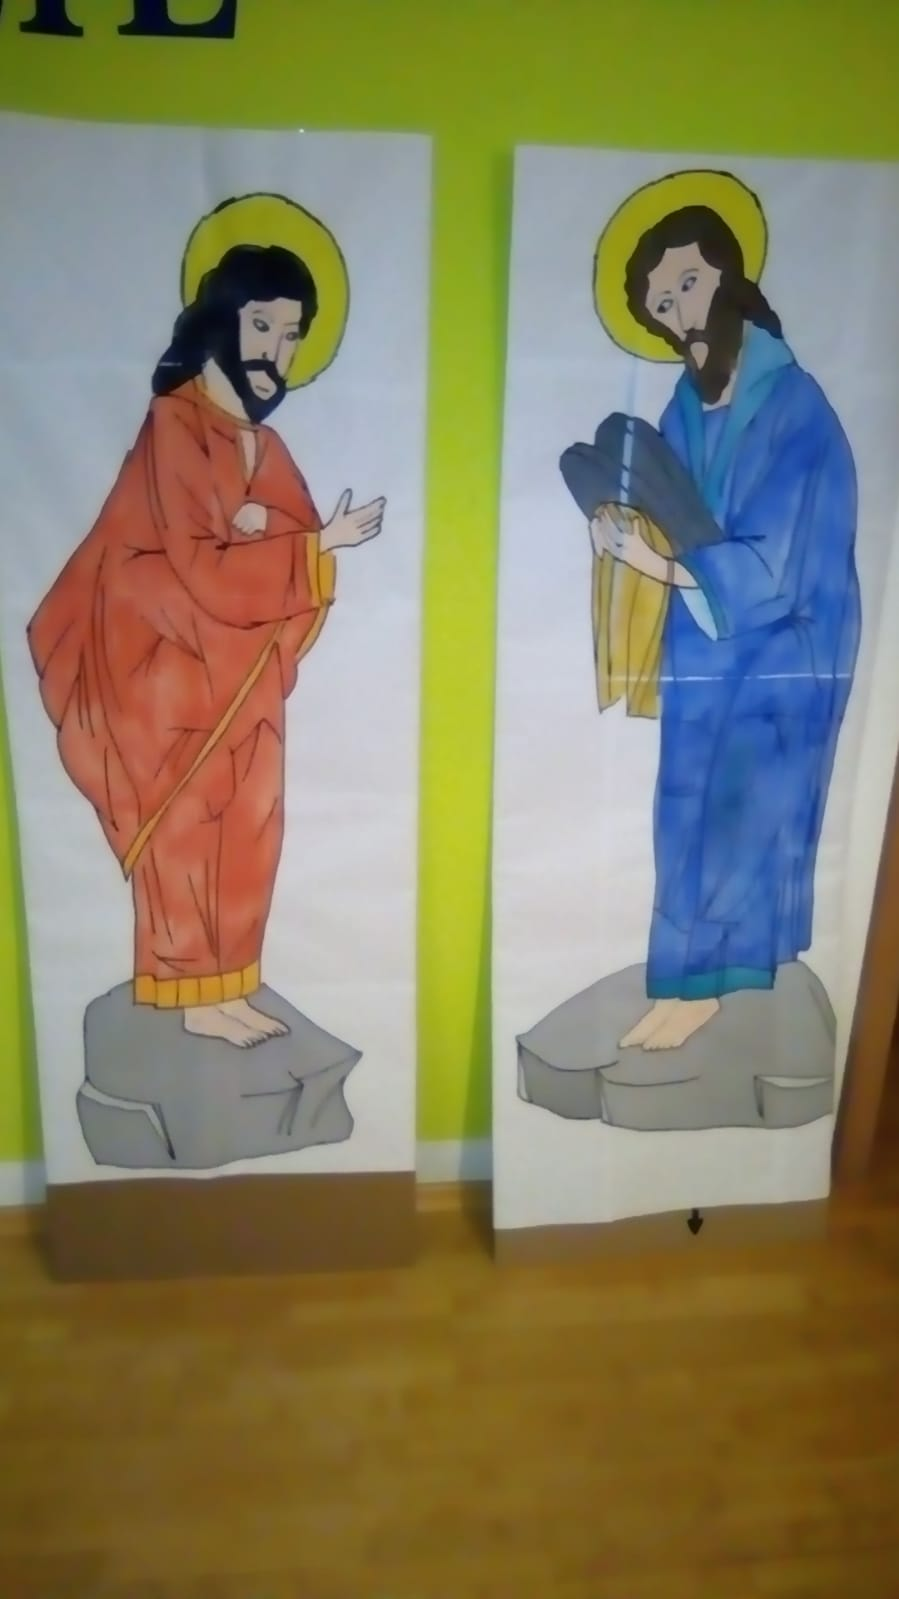 Mose und Elija zur Verklärung Christi, März 2019; Foto: Andreas Häring